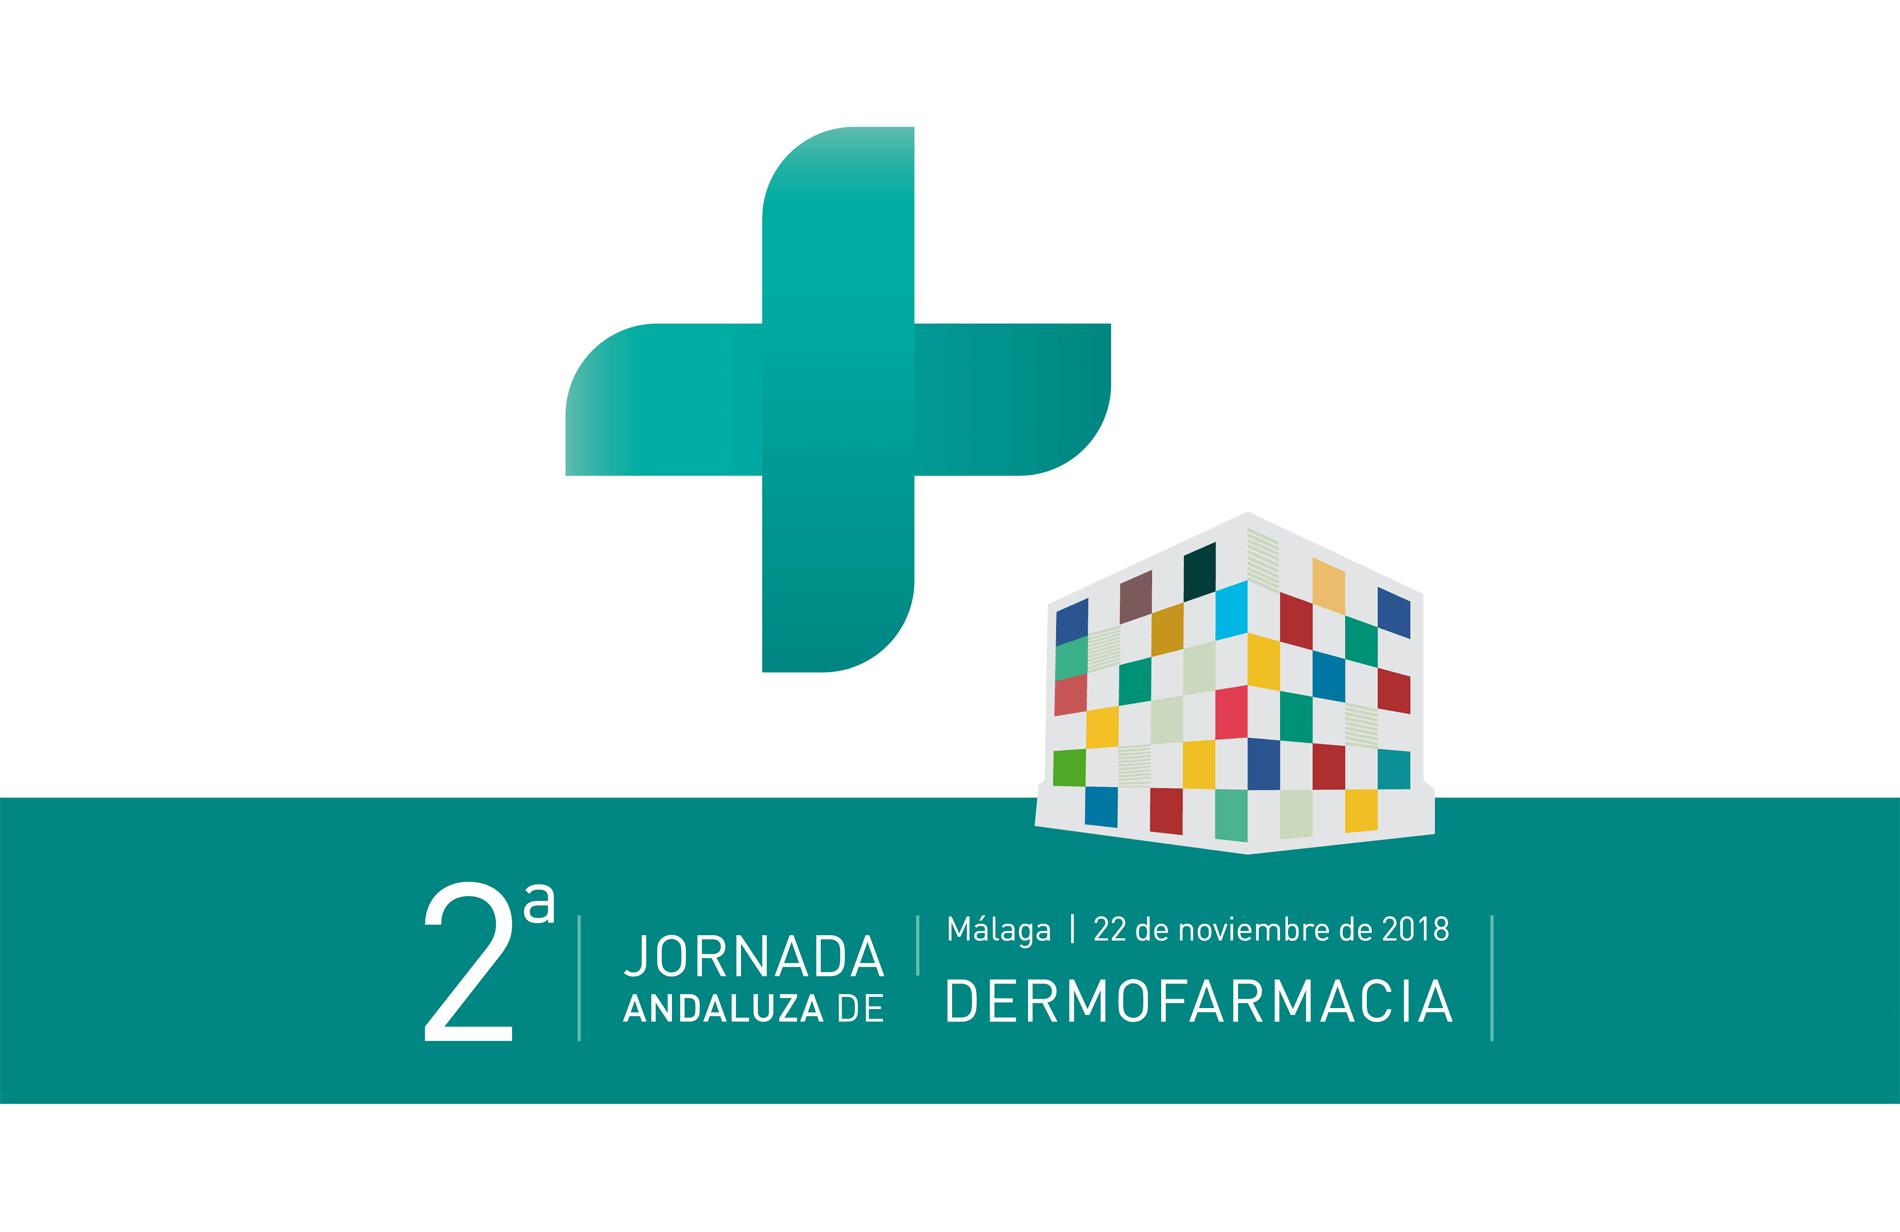 II Jornada Andaluza de DERMOFARMACIA